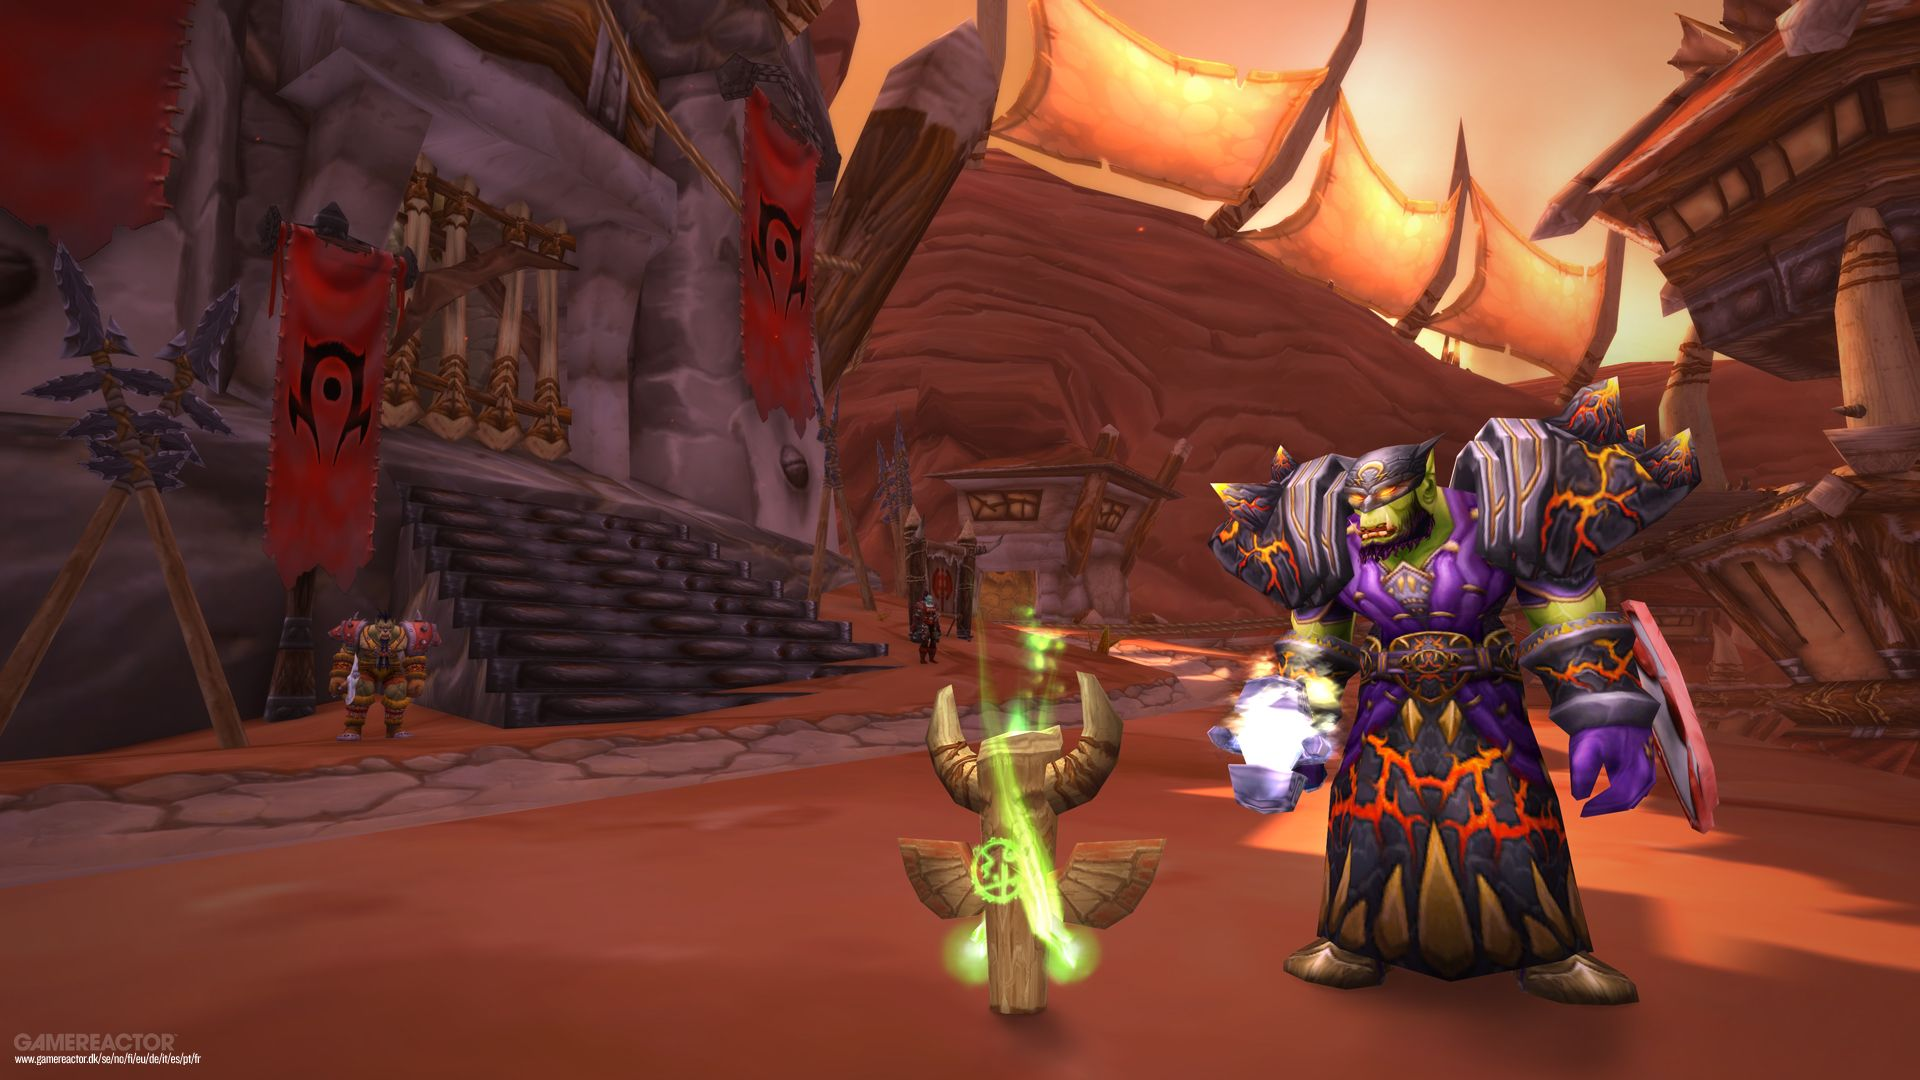 Criadores de World of Warcraft regressam para jogar WoW: Classic - World of  Warcraft: Classic - Gamereactor